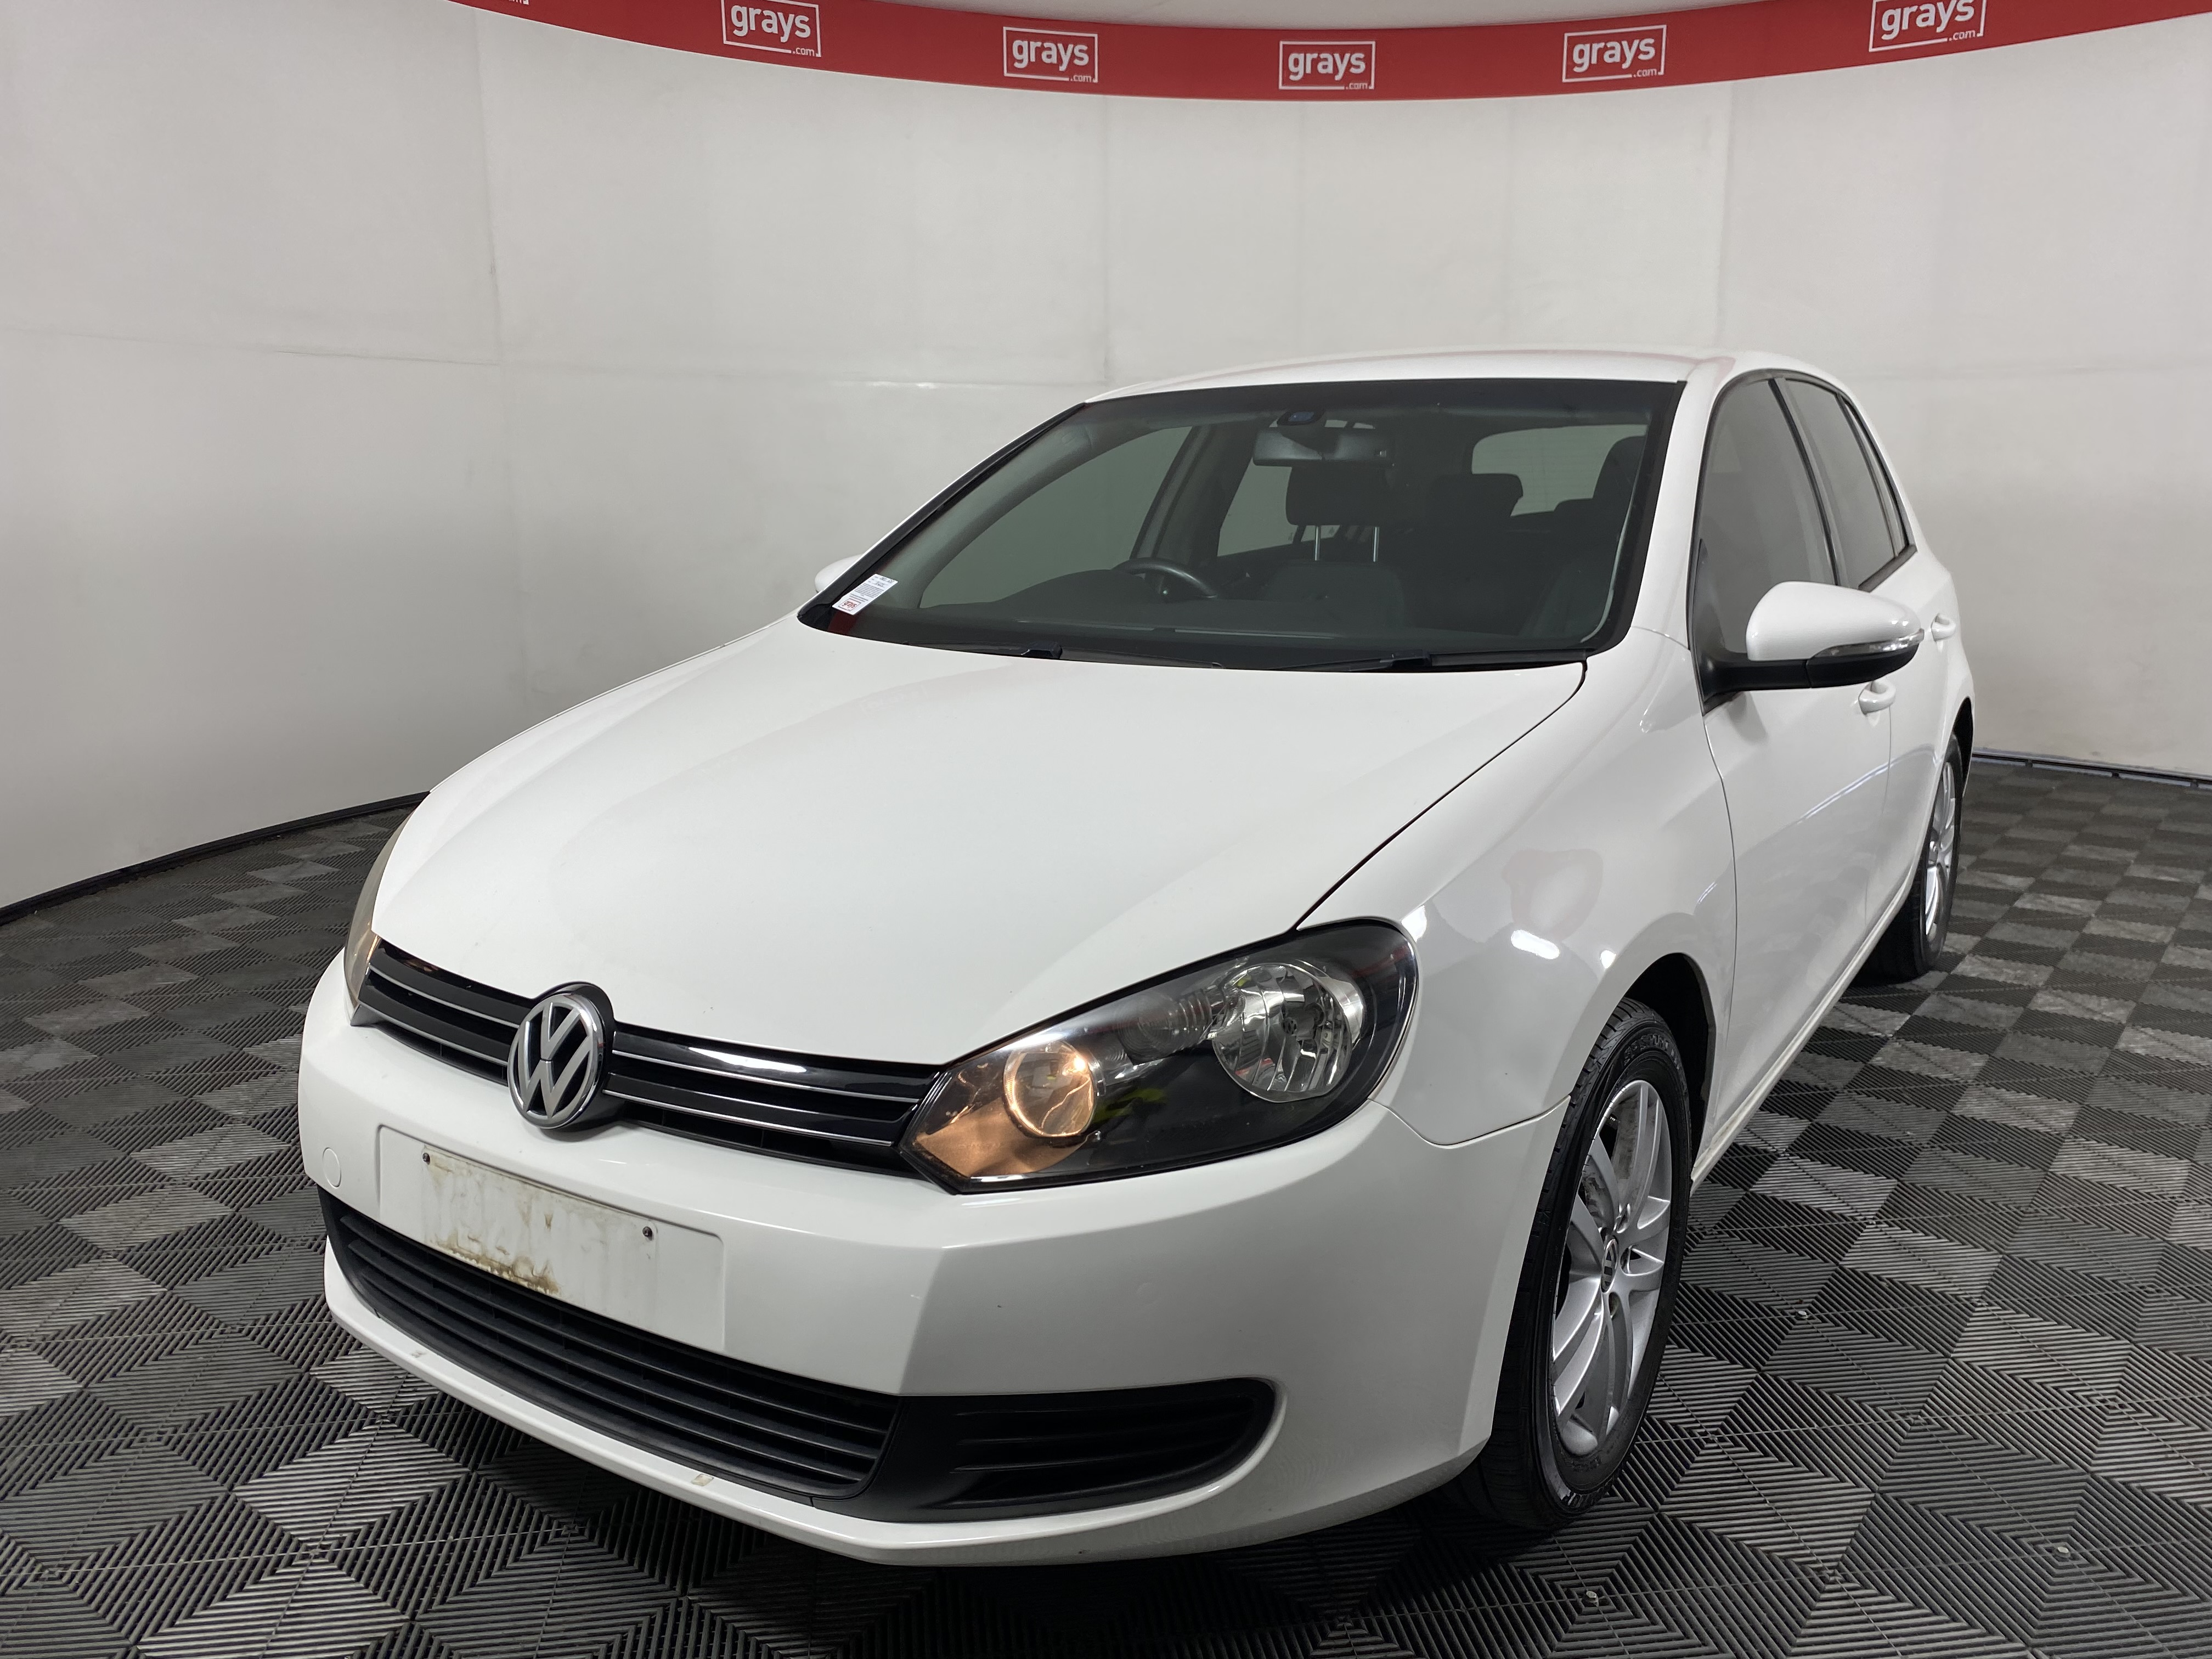 2011 Volkswagen Golf 118TSI Comfortline Auto Hatchback 127,988km